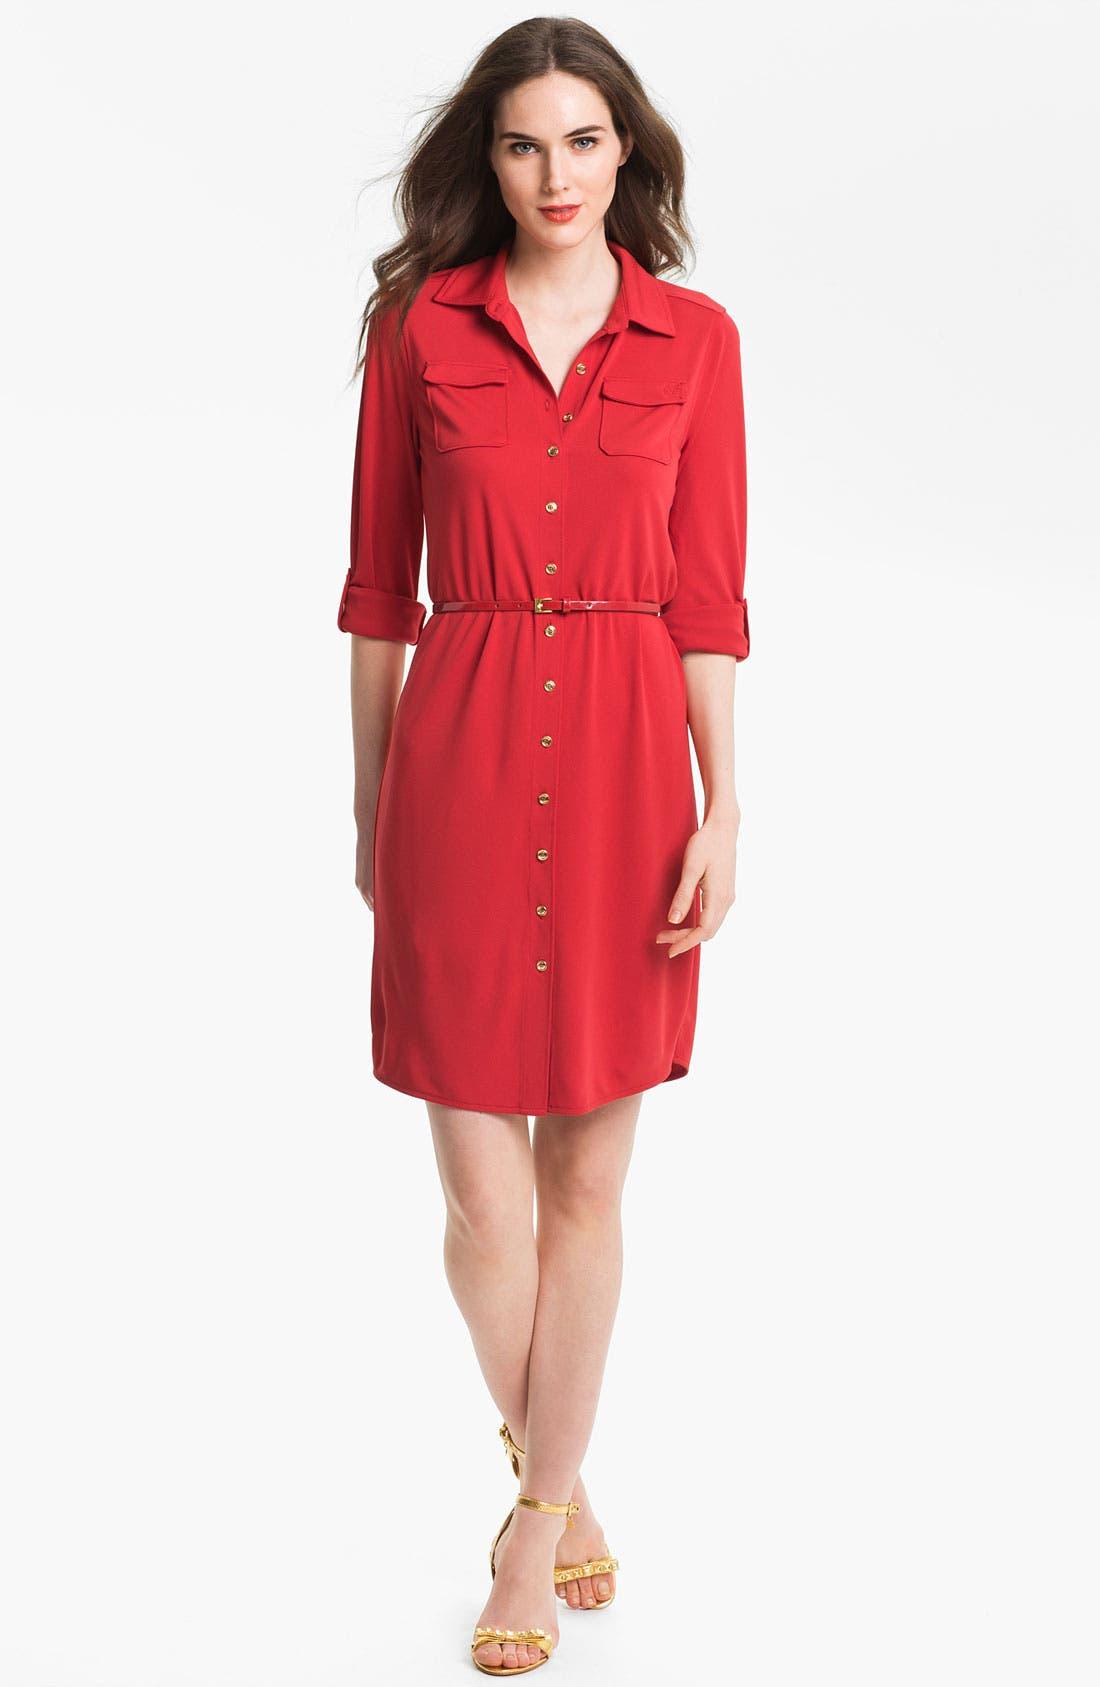 Alternate Image 1 Selected - Anne Klein 'Leo' Roll Sleeve Shirtdress